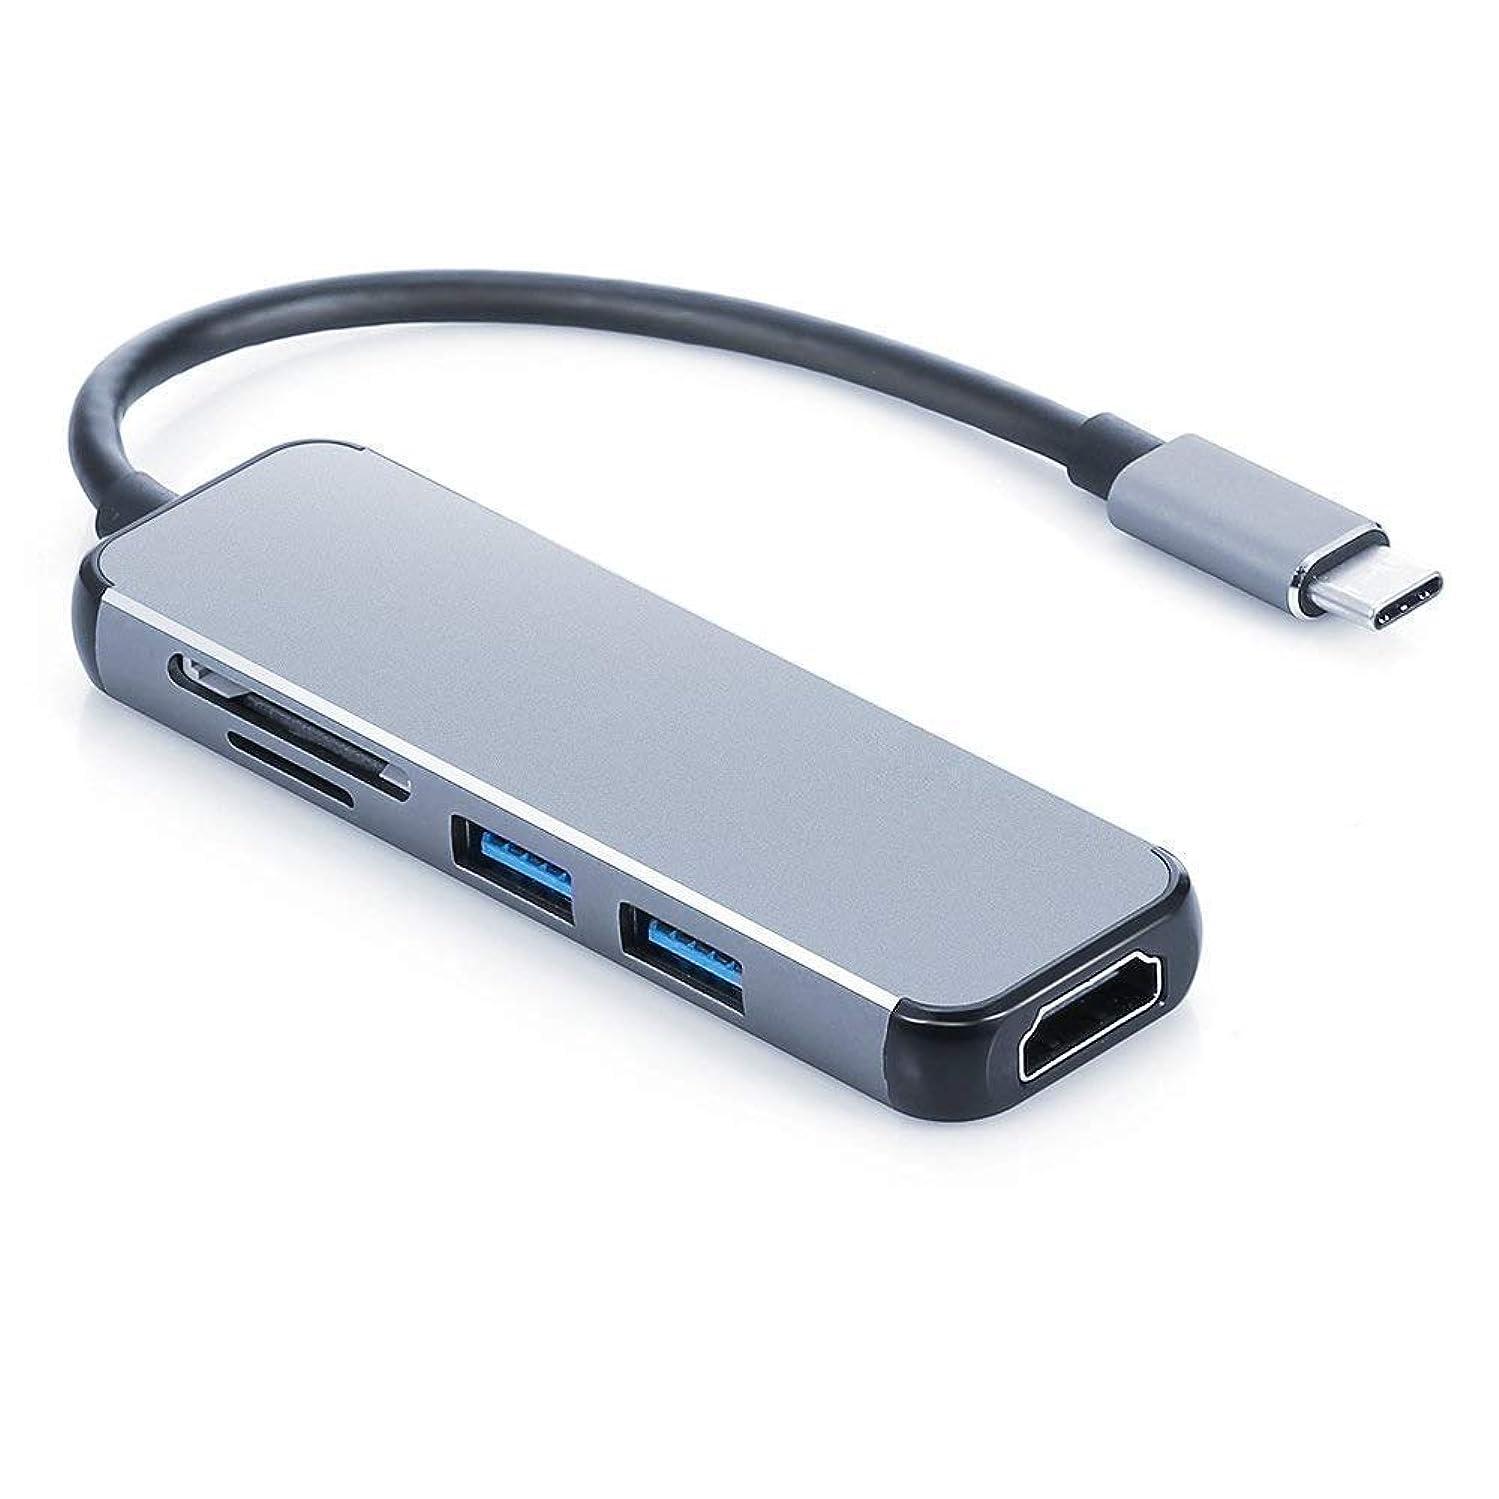 USB C Adapter, Type C HDMI Adapter, USB C Hub Docker convertor with Multiport USB 3.0,SD/TF Card Reader for New MacBook Pro, Google Chromebook, Samsung Galaxy S8/S9,HP/Dell,USB-C Device Grey